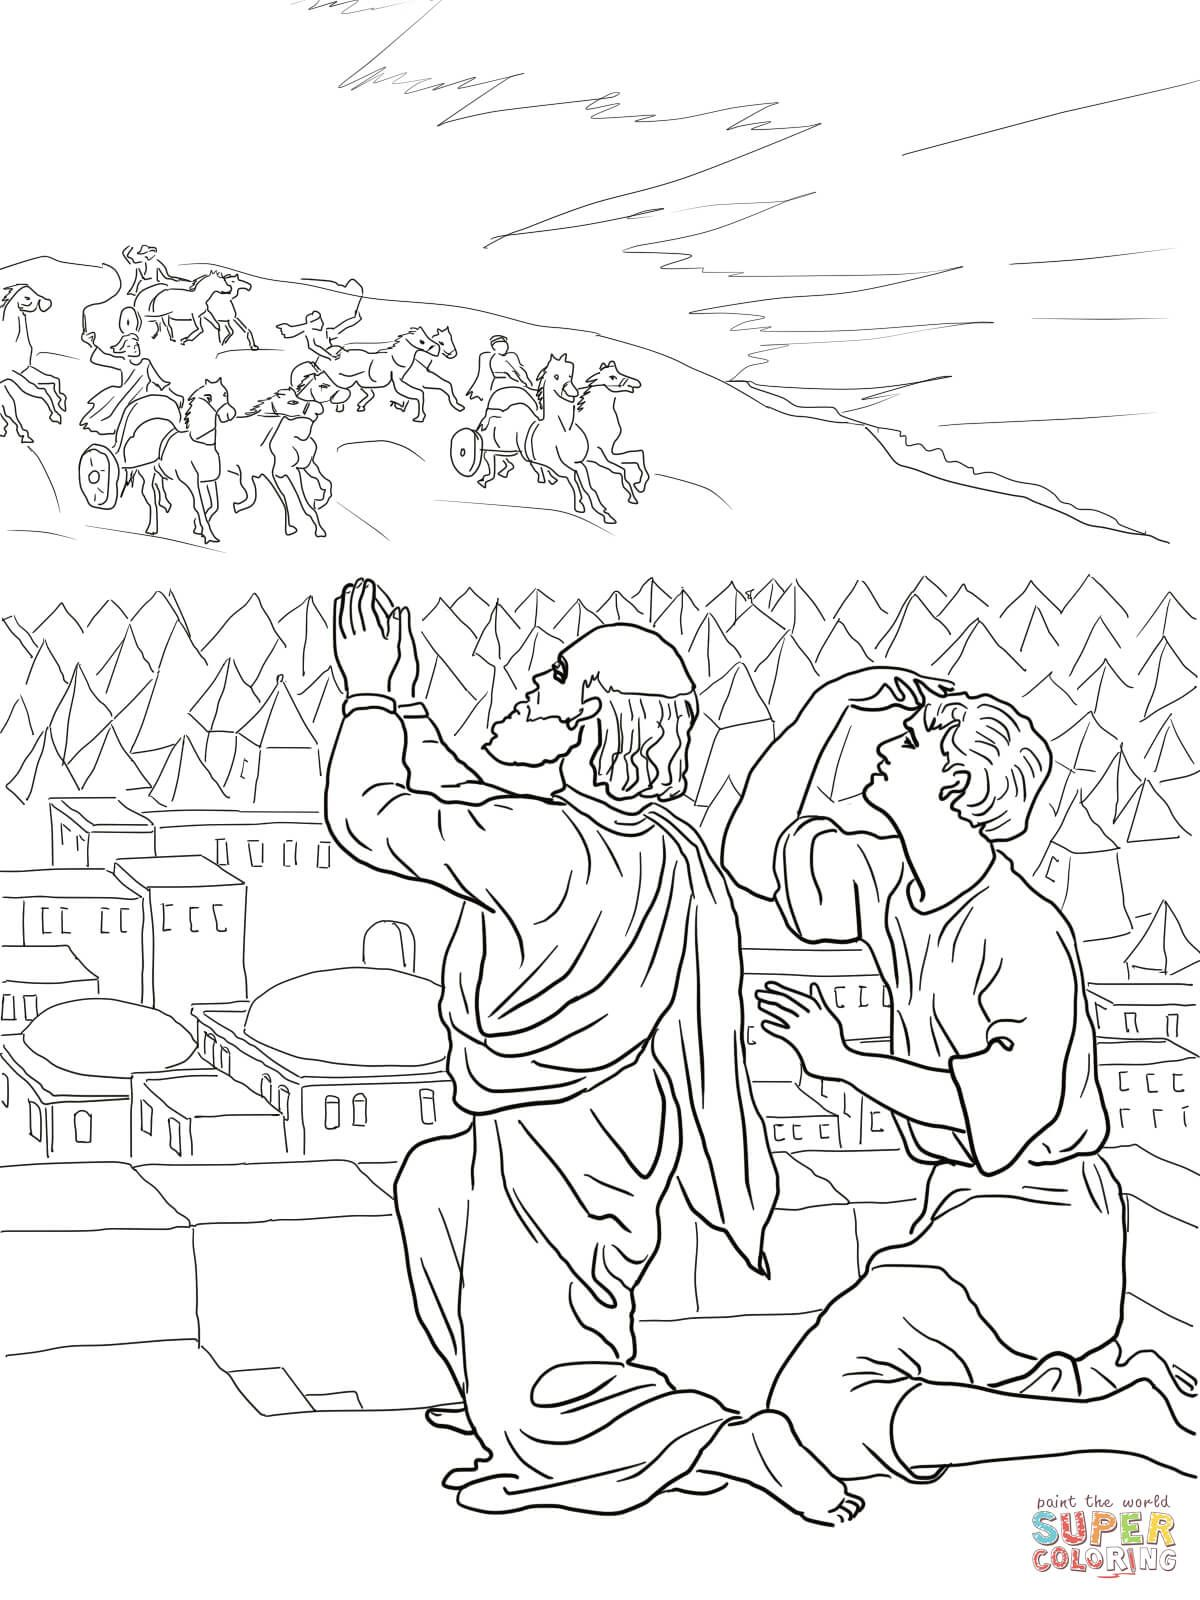 Elisha Fiery Army Coloring Page Free Printable Coloring